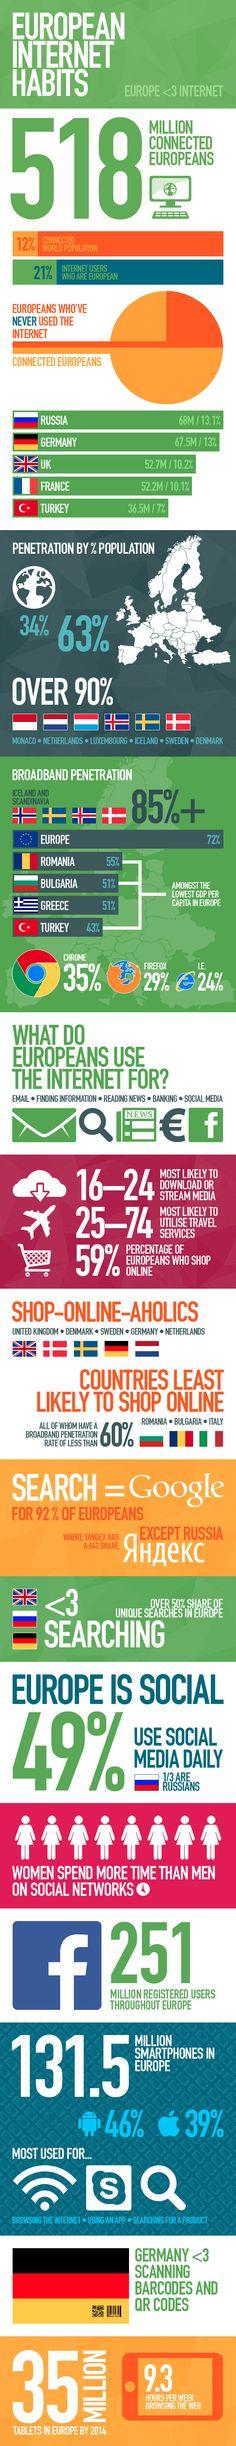 The Web Usage Habits of Europeans [Infographic] | Get Elastic Ecommerce Blog